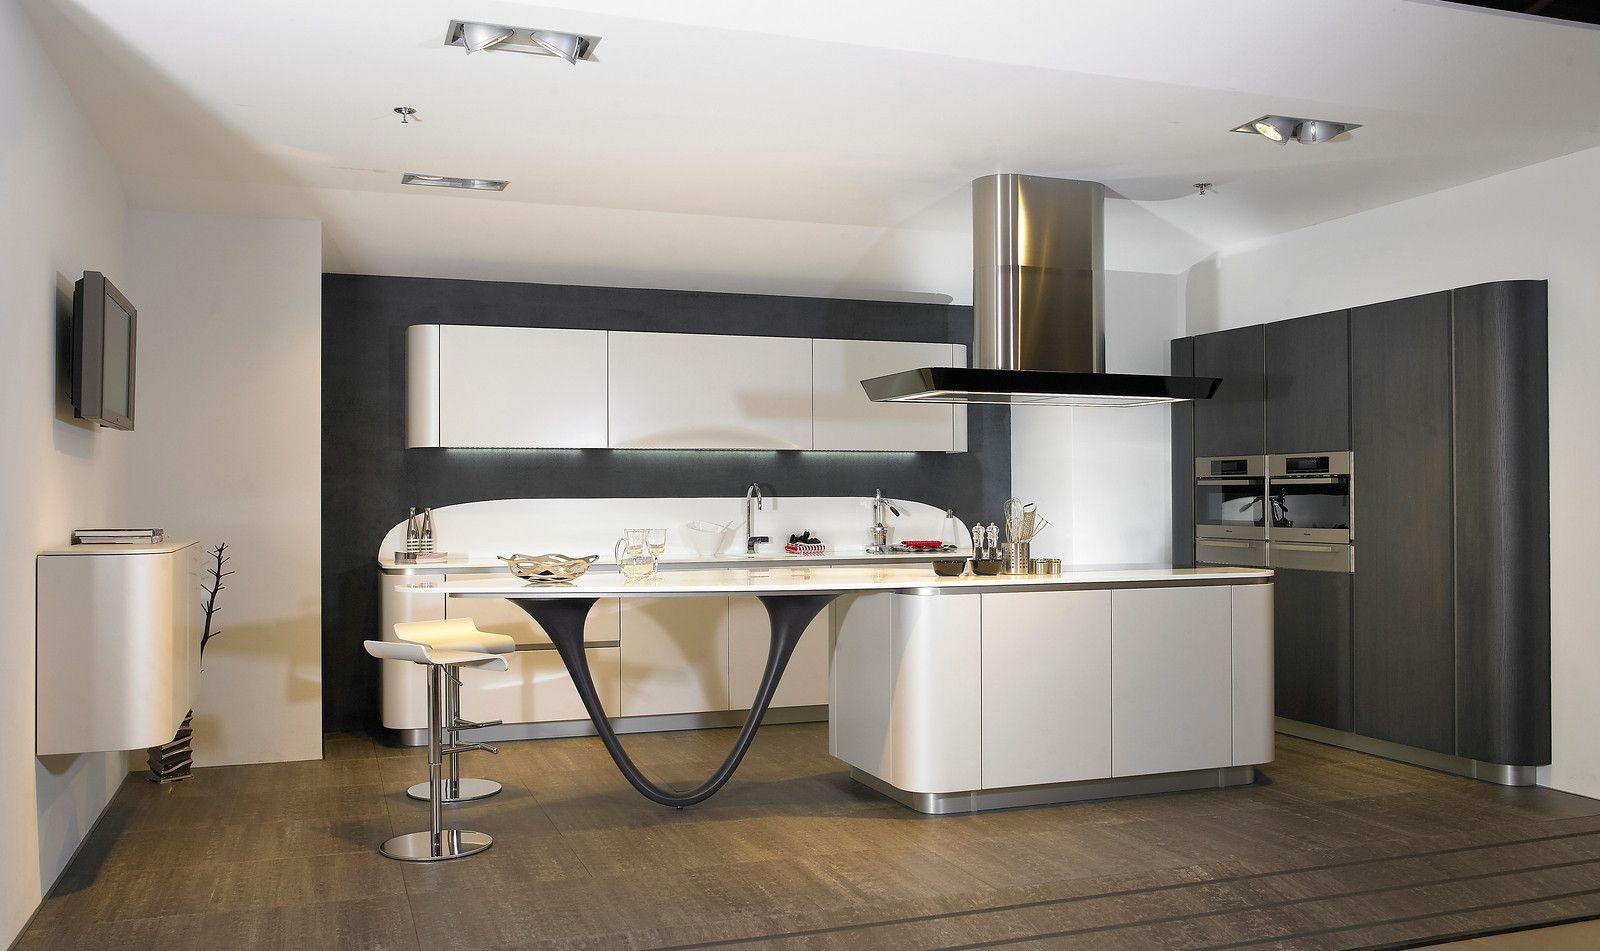 Italiaans Design Keuken : Nieuwste keukenmodel van snaidero ola by tieleman keukens